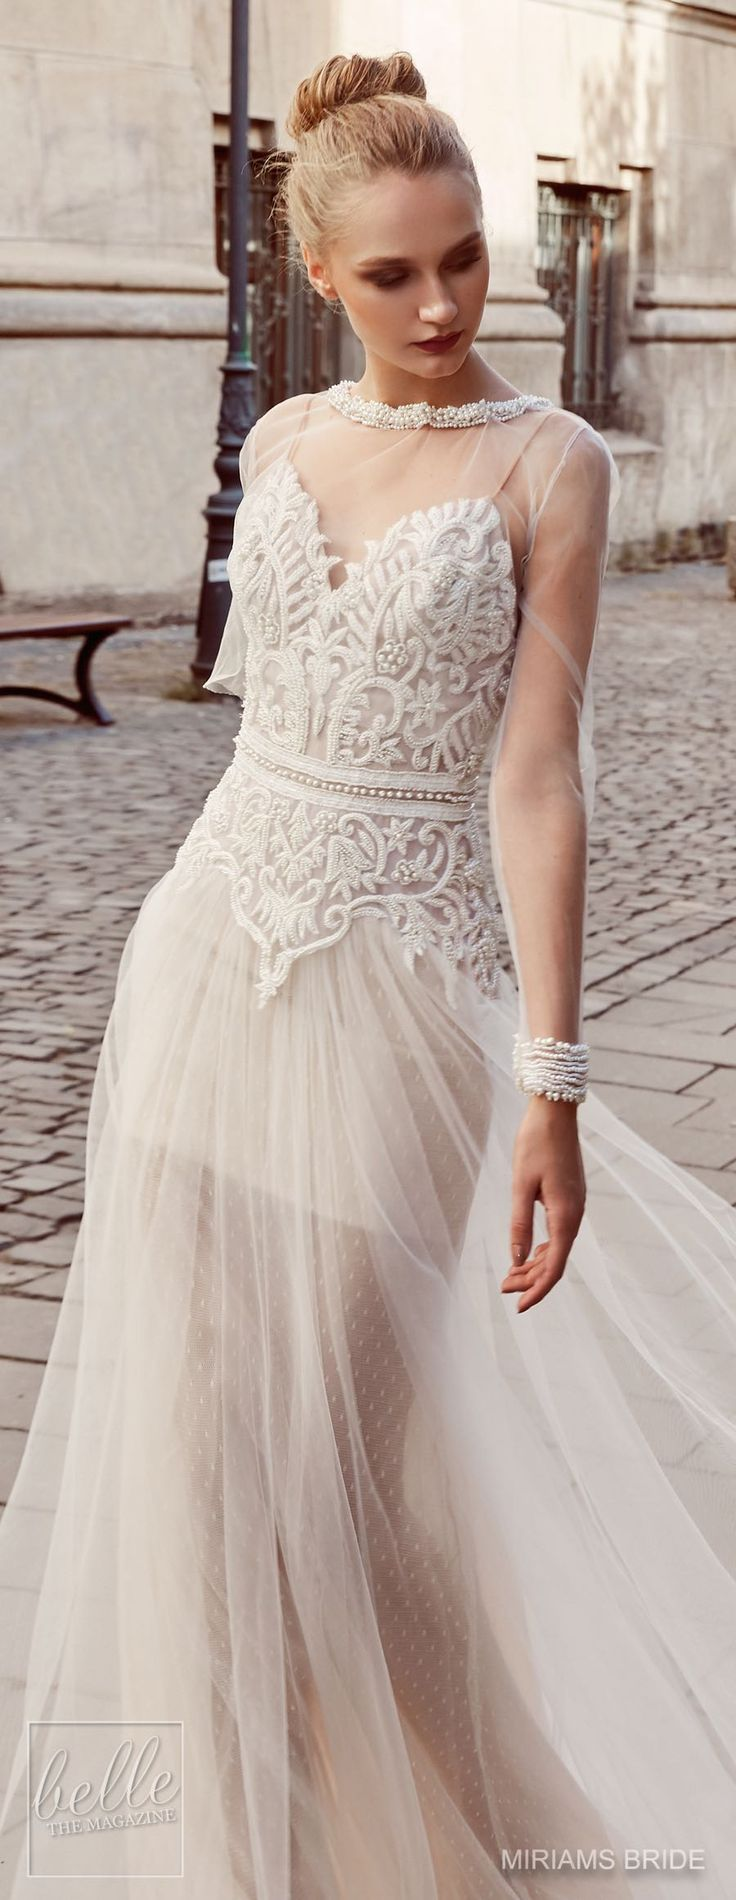 4803 best Novia y novio images on Pinterest   Gown wedding ...